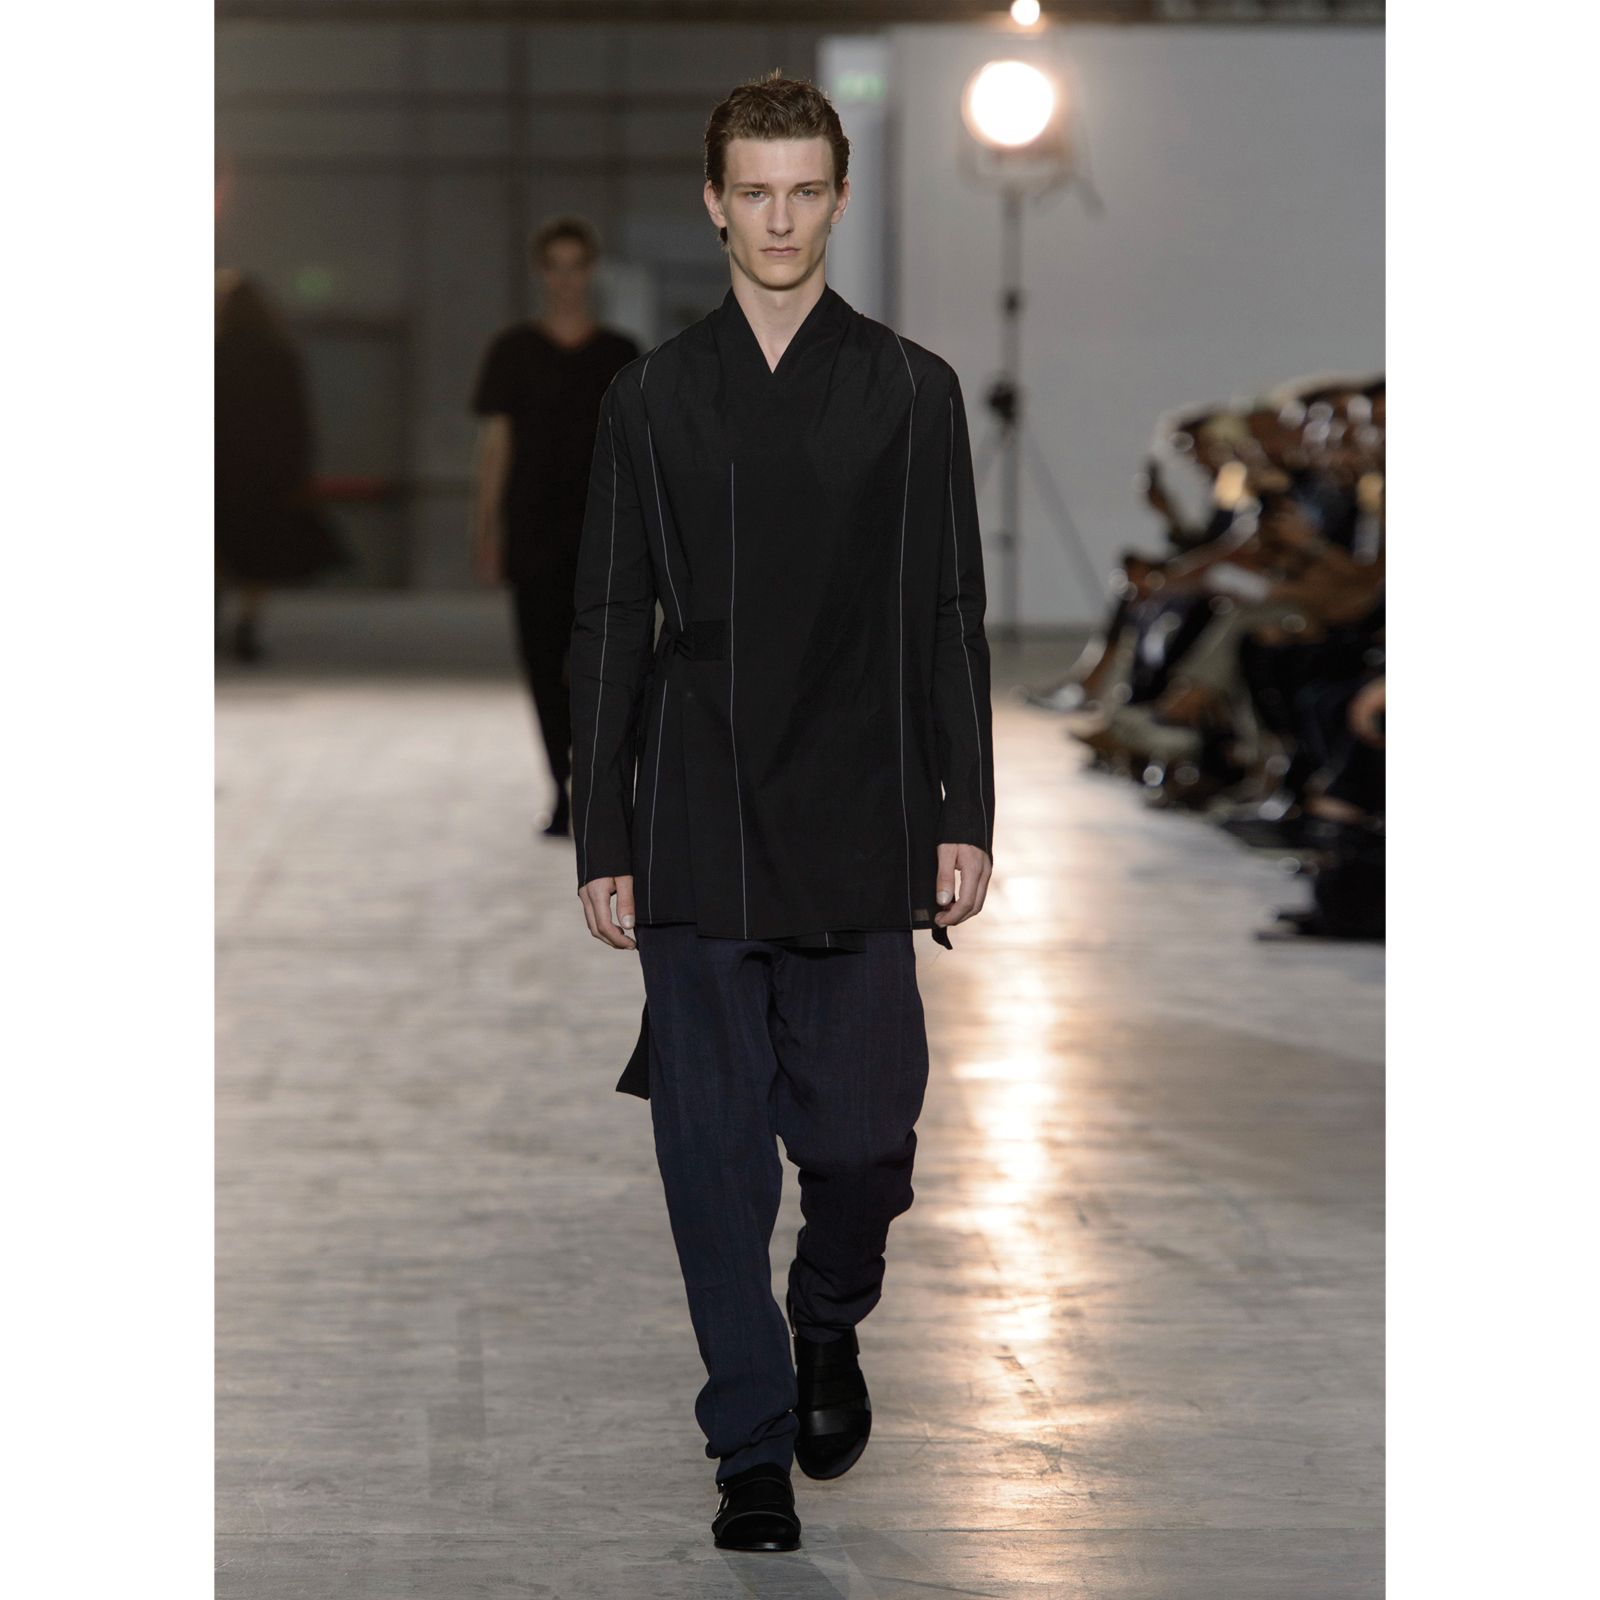 Damir Doma Men's SS16 Collection: Look 25 - Jahi Wrap Jacket, Plectro Stripe Trousers And Fiesta Sandals. https://www.instagram.com/p/BBXzhgUJ-5j/?taken-by=damirdomaofficial